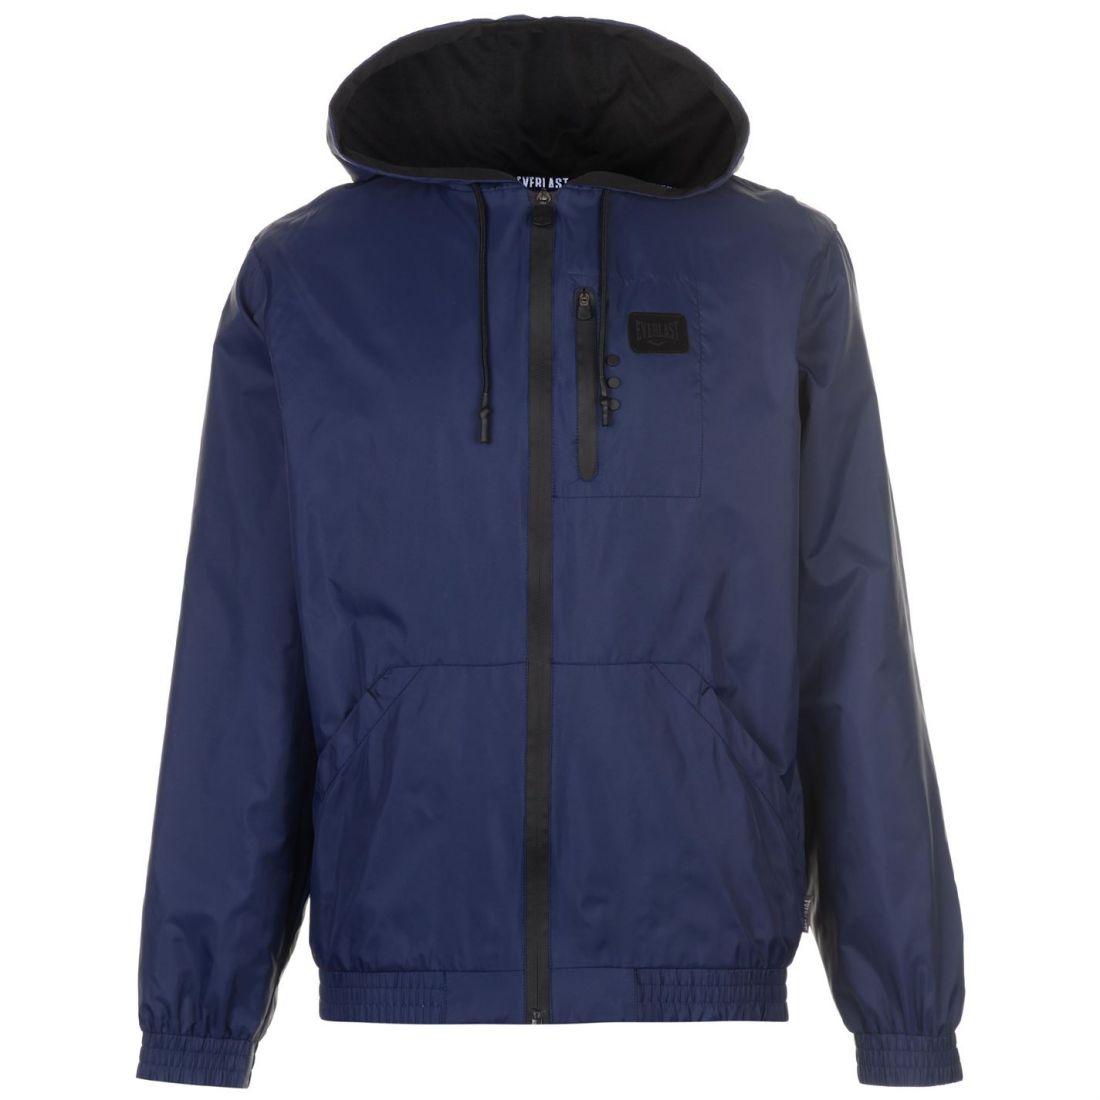 Men's Clothing Coats & Jackets Everlast Geo Rain Jacket Mens Black Uk Mens Size L